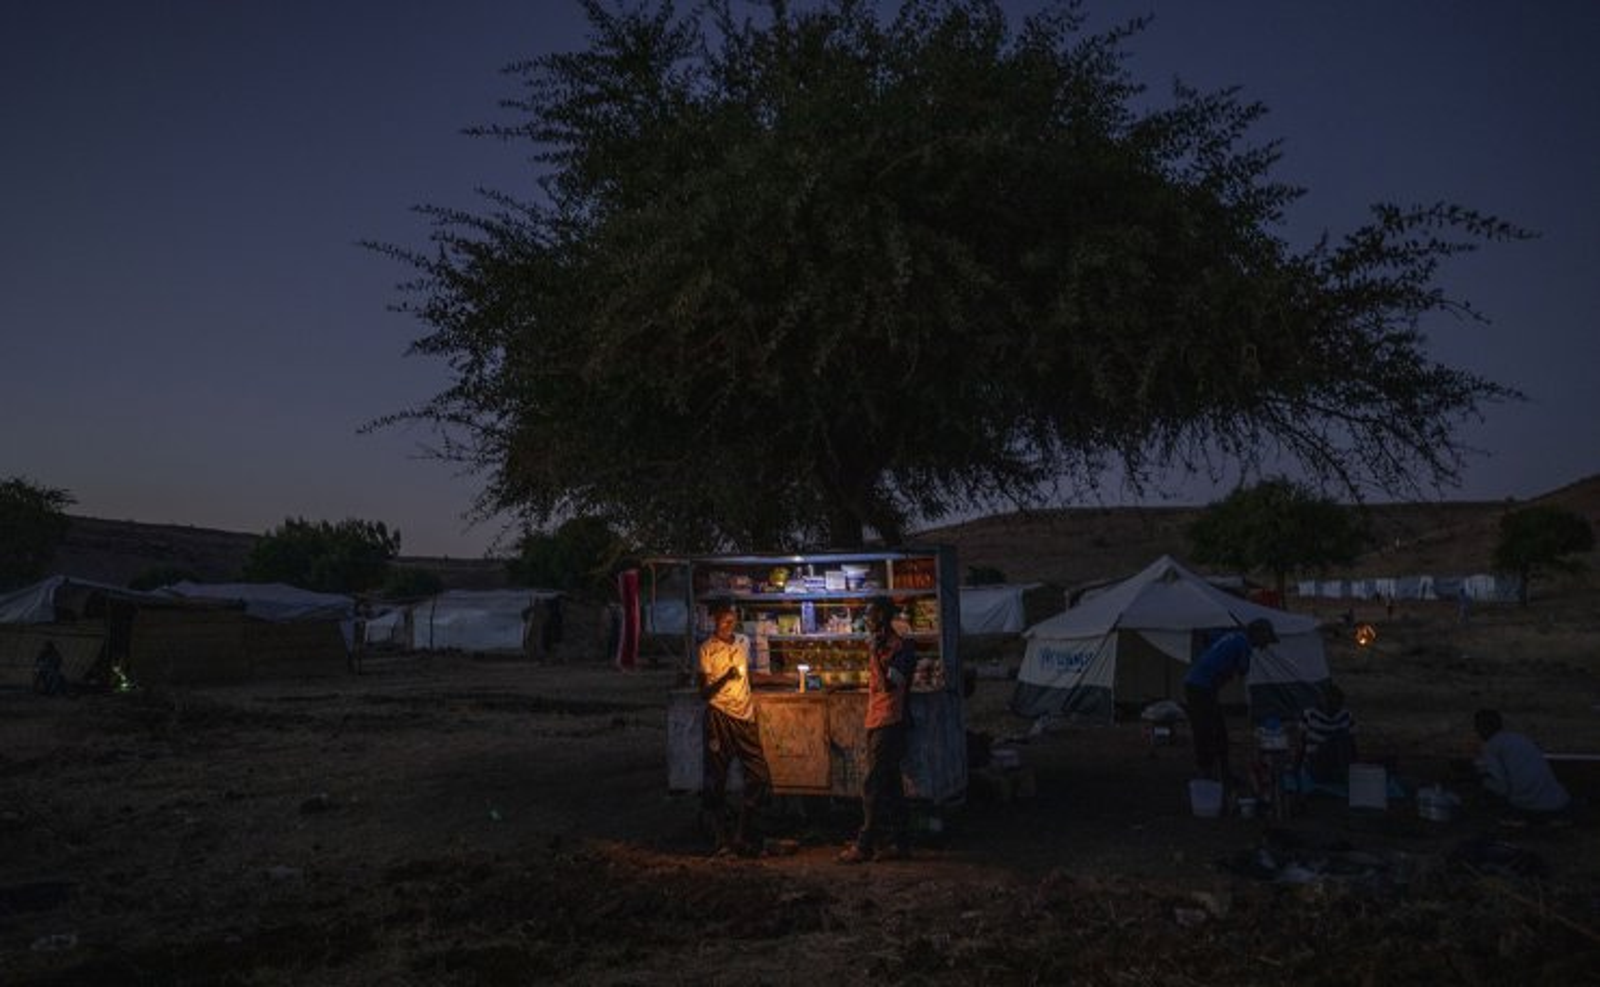 Tigrinyan refugee men sell goods in their shack to make a living at Umm Rakouba refugee camp in Qadarif, eastern Sudan, Friday, Dec. 11, 2020. AP